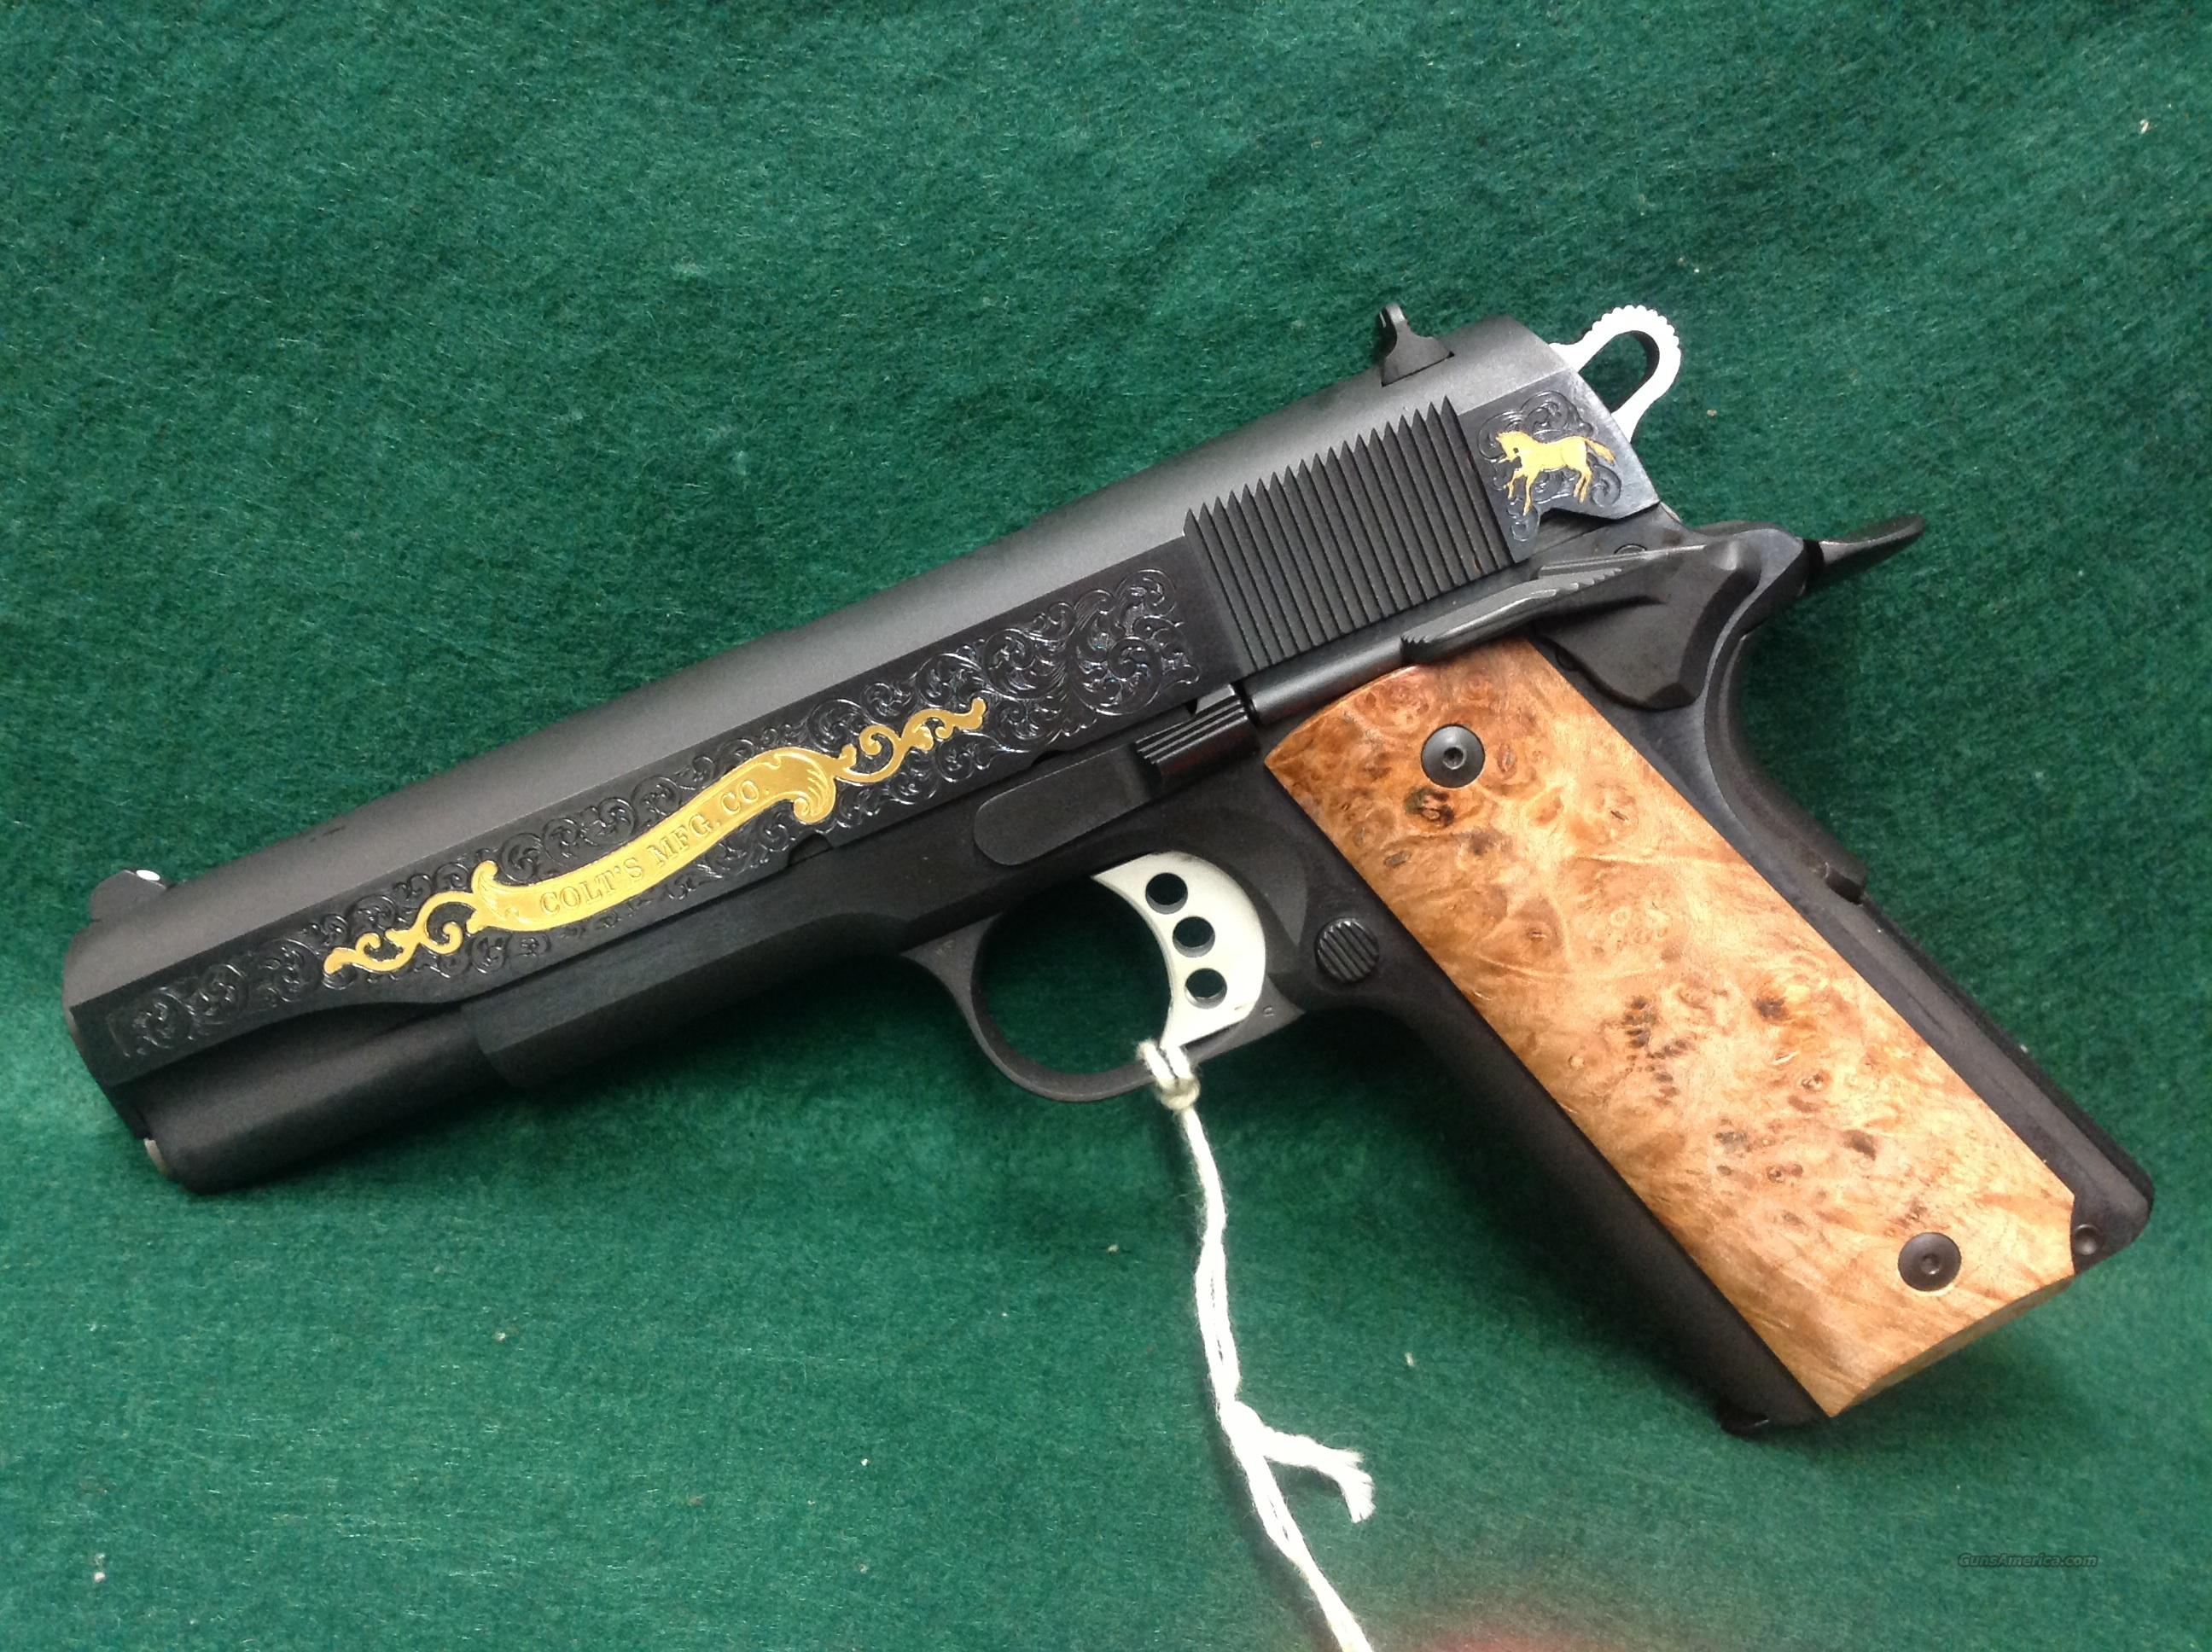 Colt Government Model 45 W/ Gold Engraving  Guns > Pistols > Colt Automatic Pistols (1911 & Var)